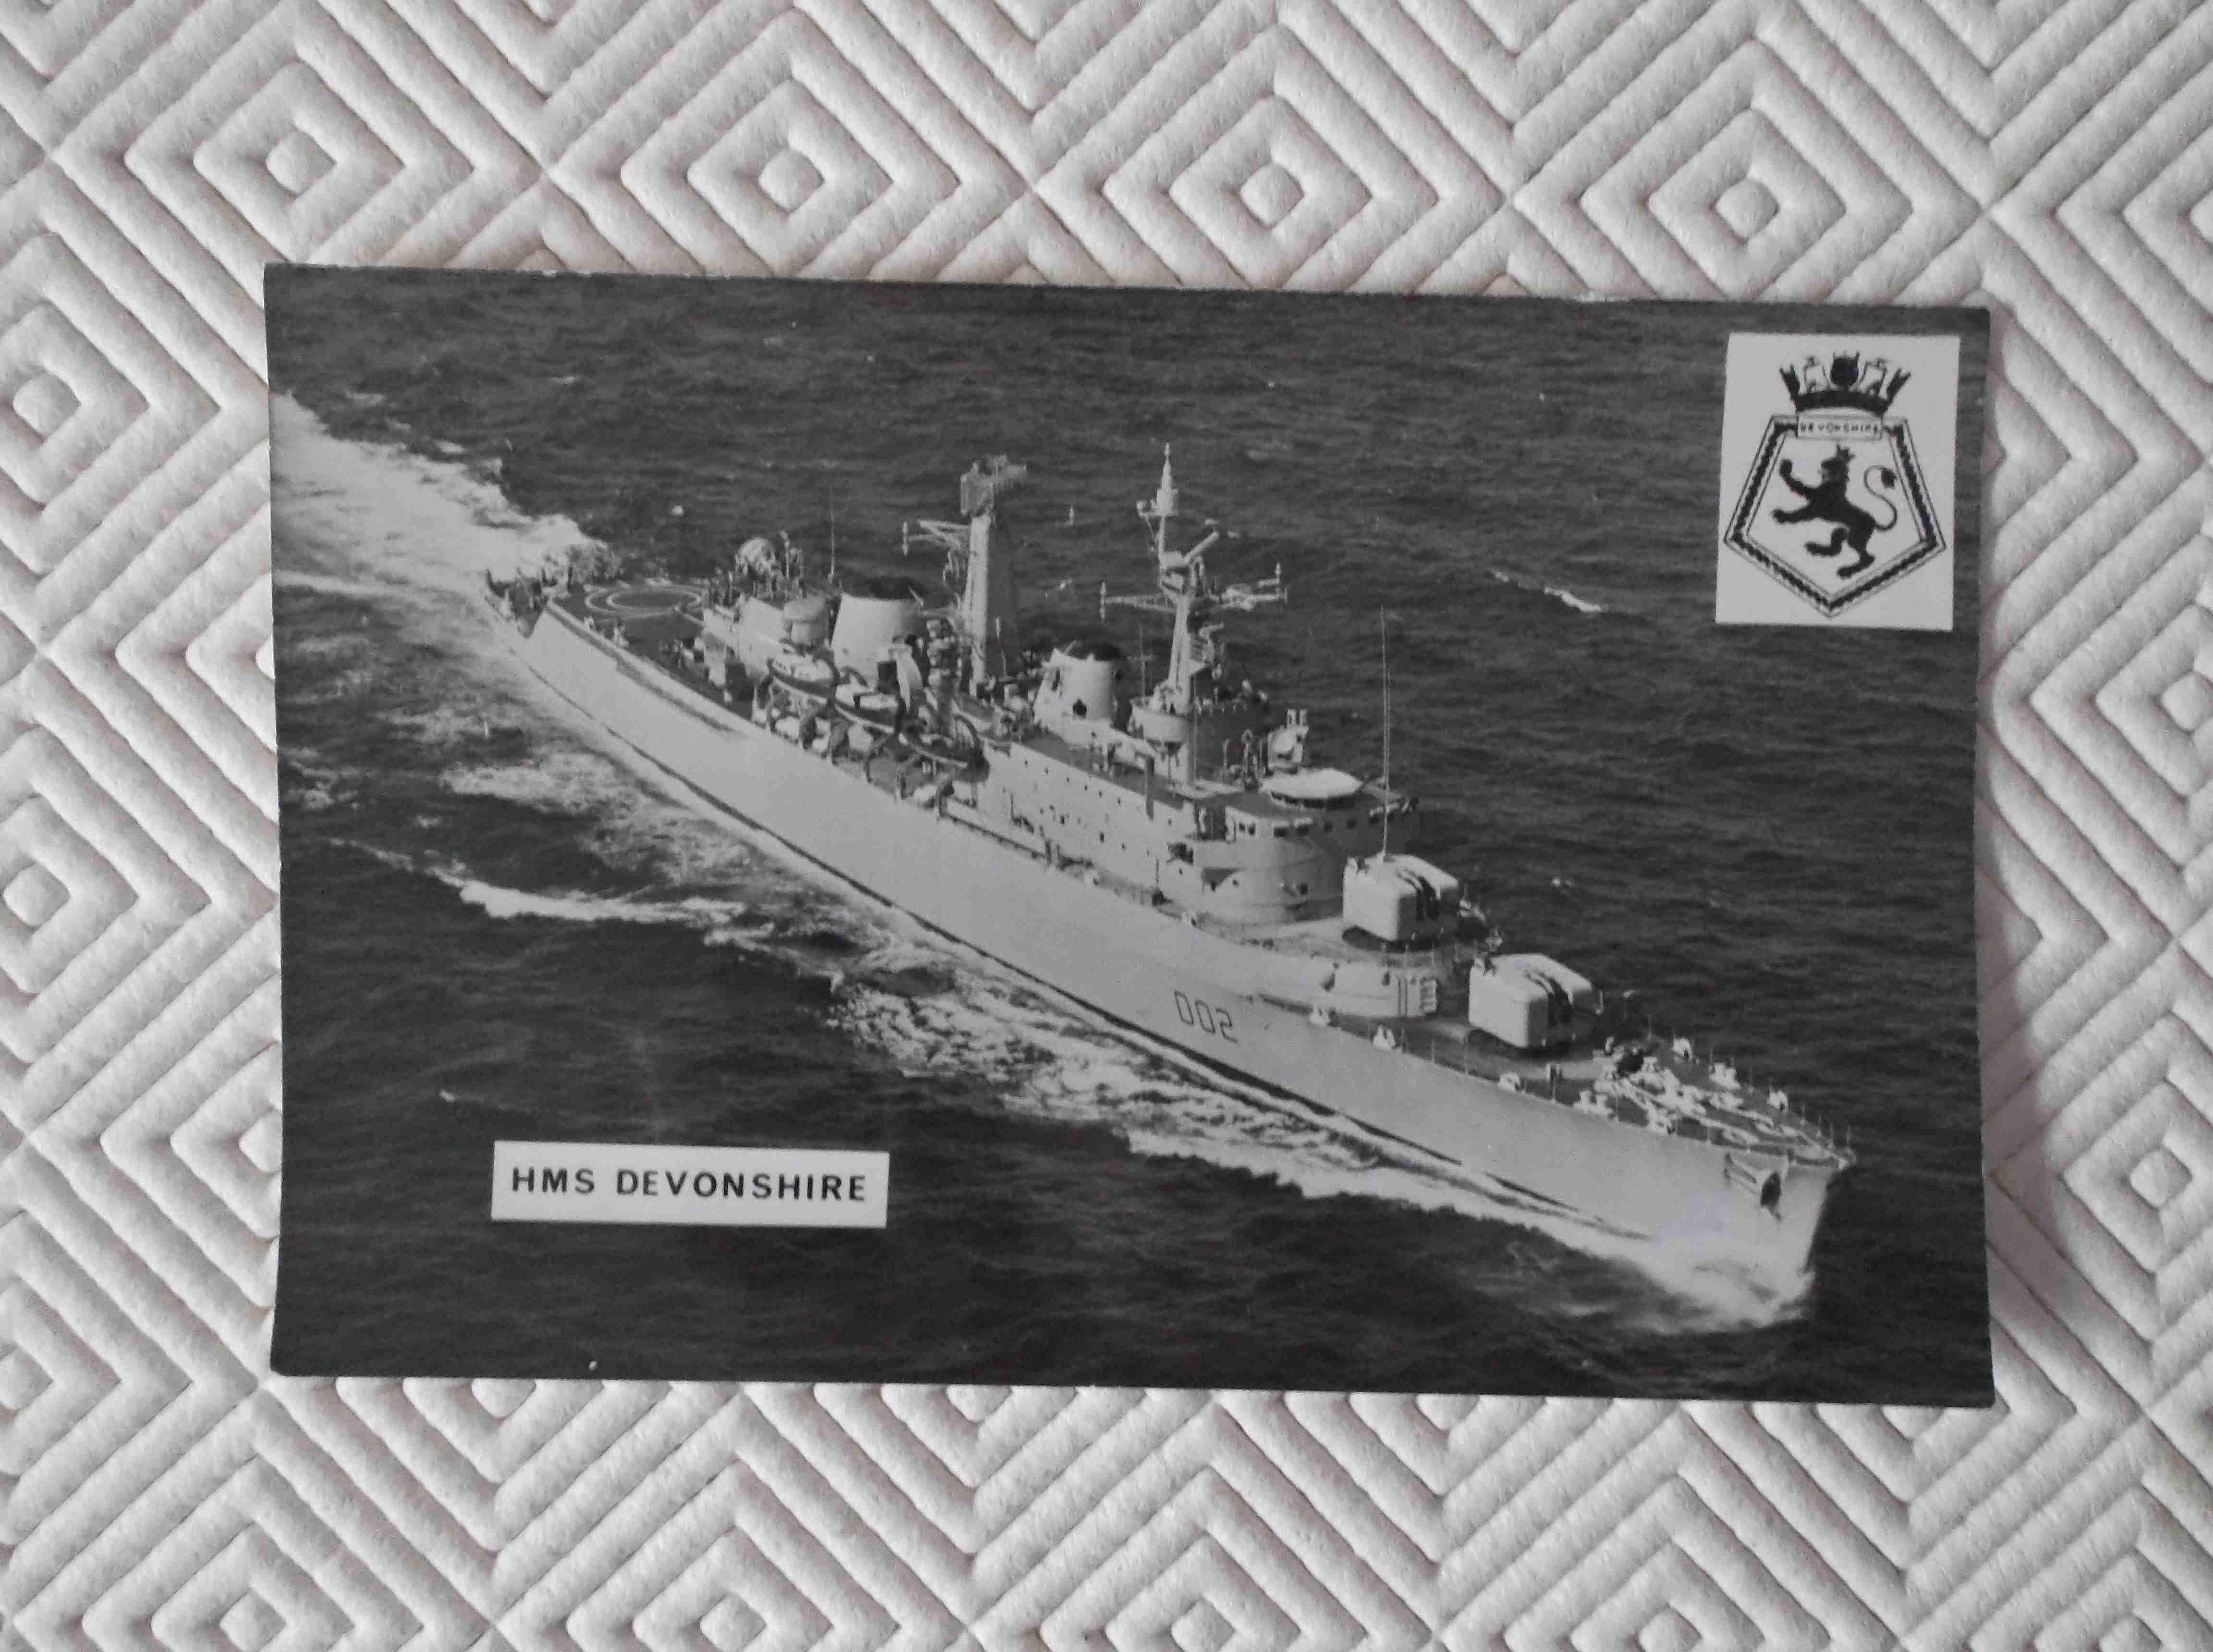 POSTCARD SIZE PHOTOGRAPH OF THE ROYAL NAVAL VESSEL HMS DEVONSHIRE